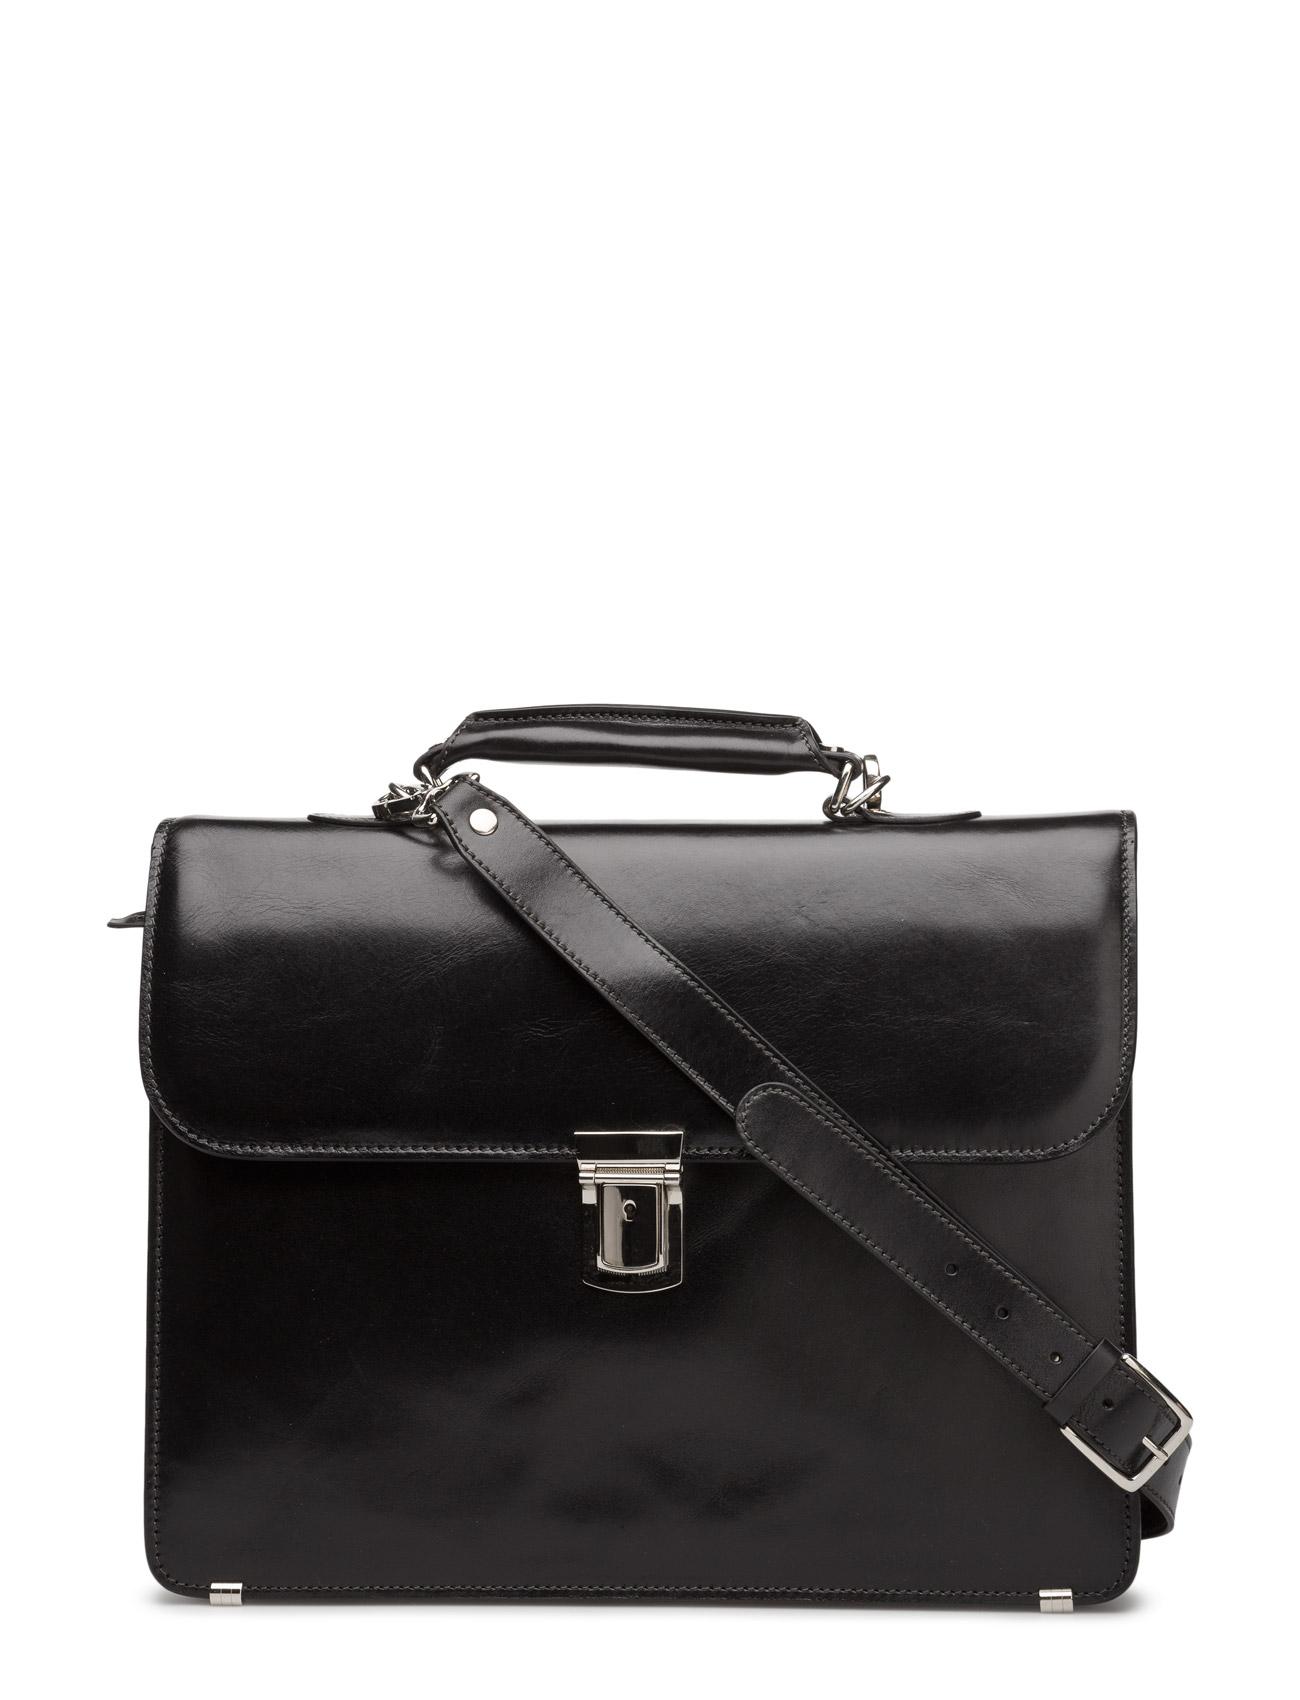 baron – Briefcase small på boozt.com dk